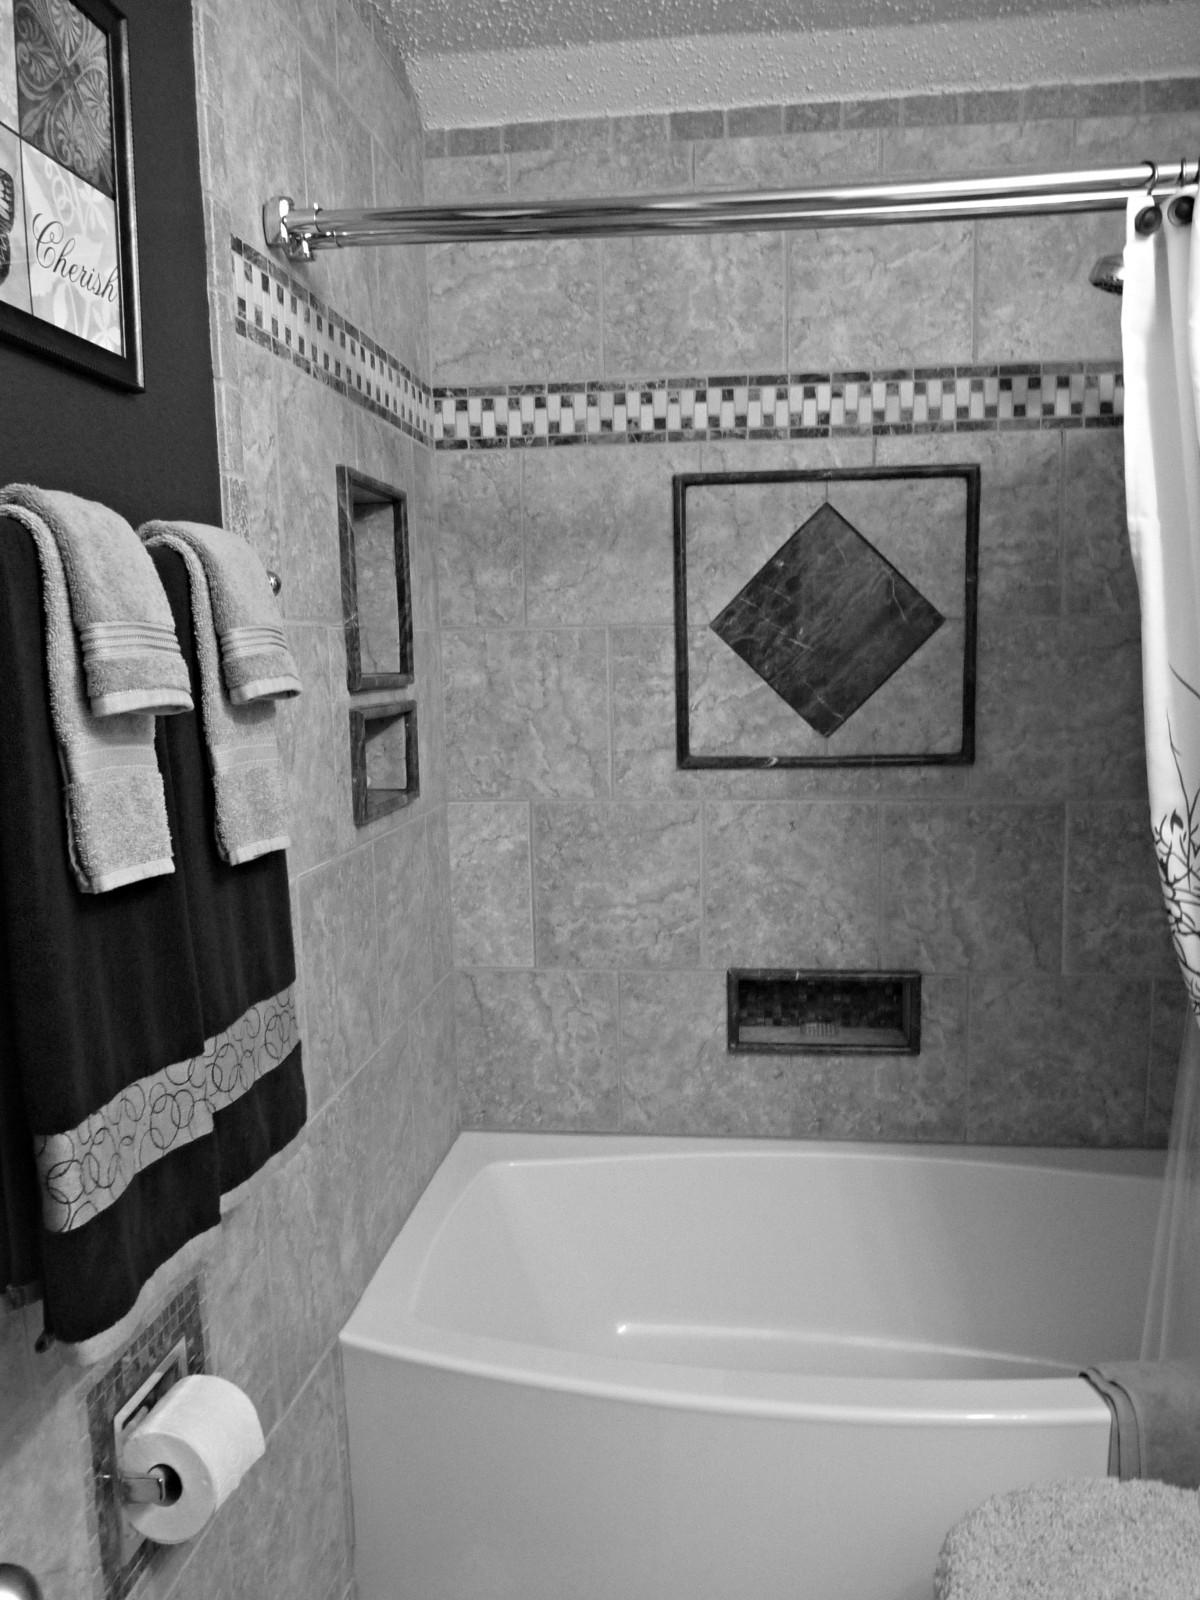 Fotos Gratis Casa Piso Limpiar Lavar Ba 241 O Azulejo